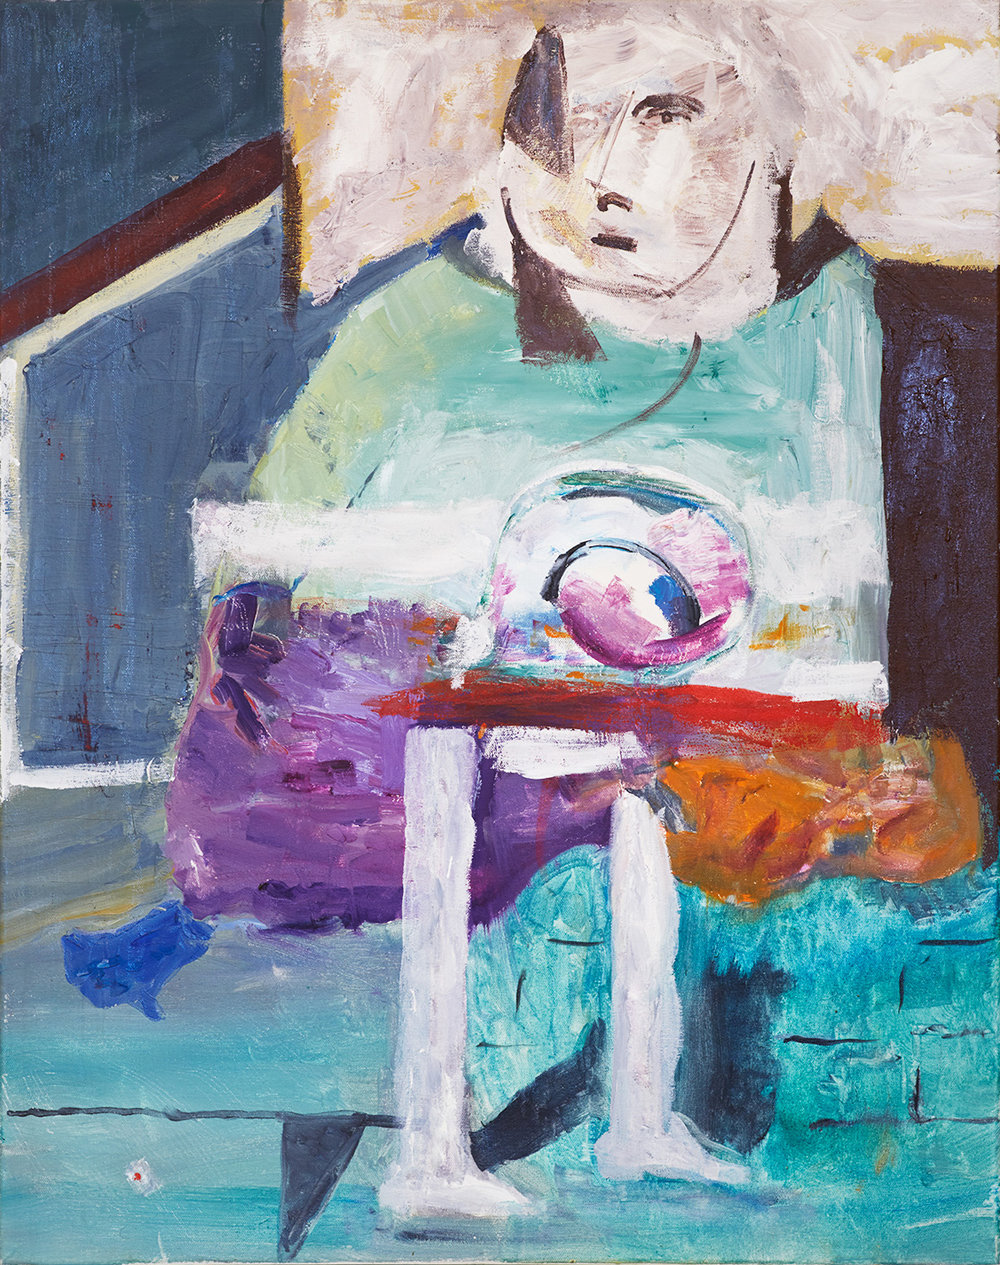 "Edna , 24 x 30"", oil on canvas, 2016"